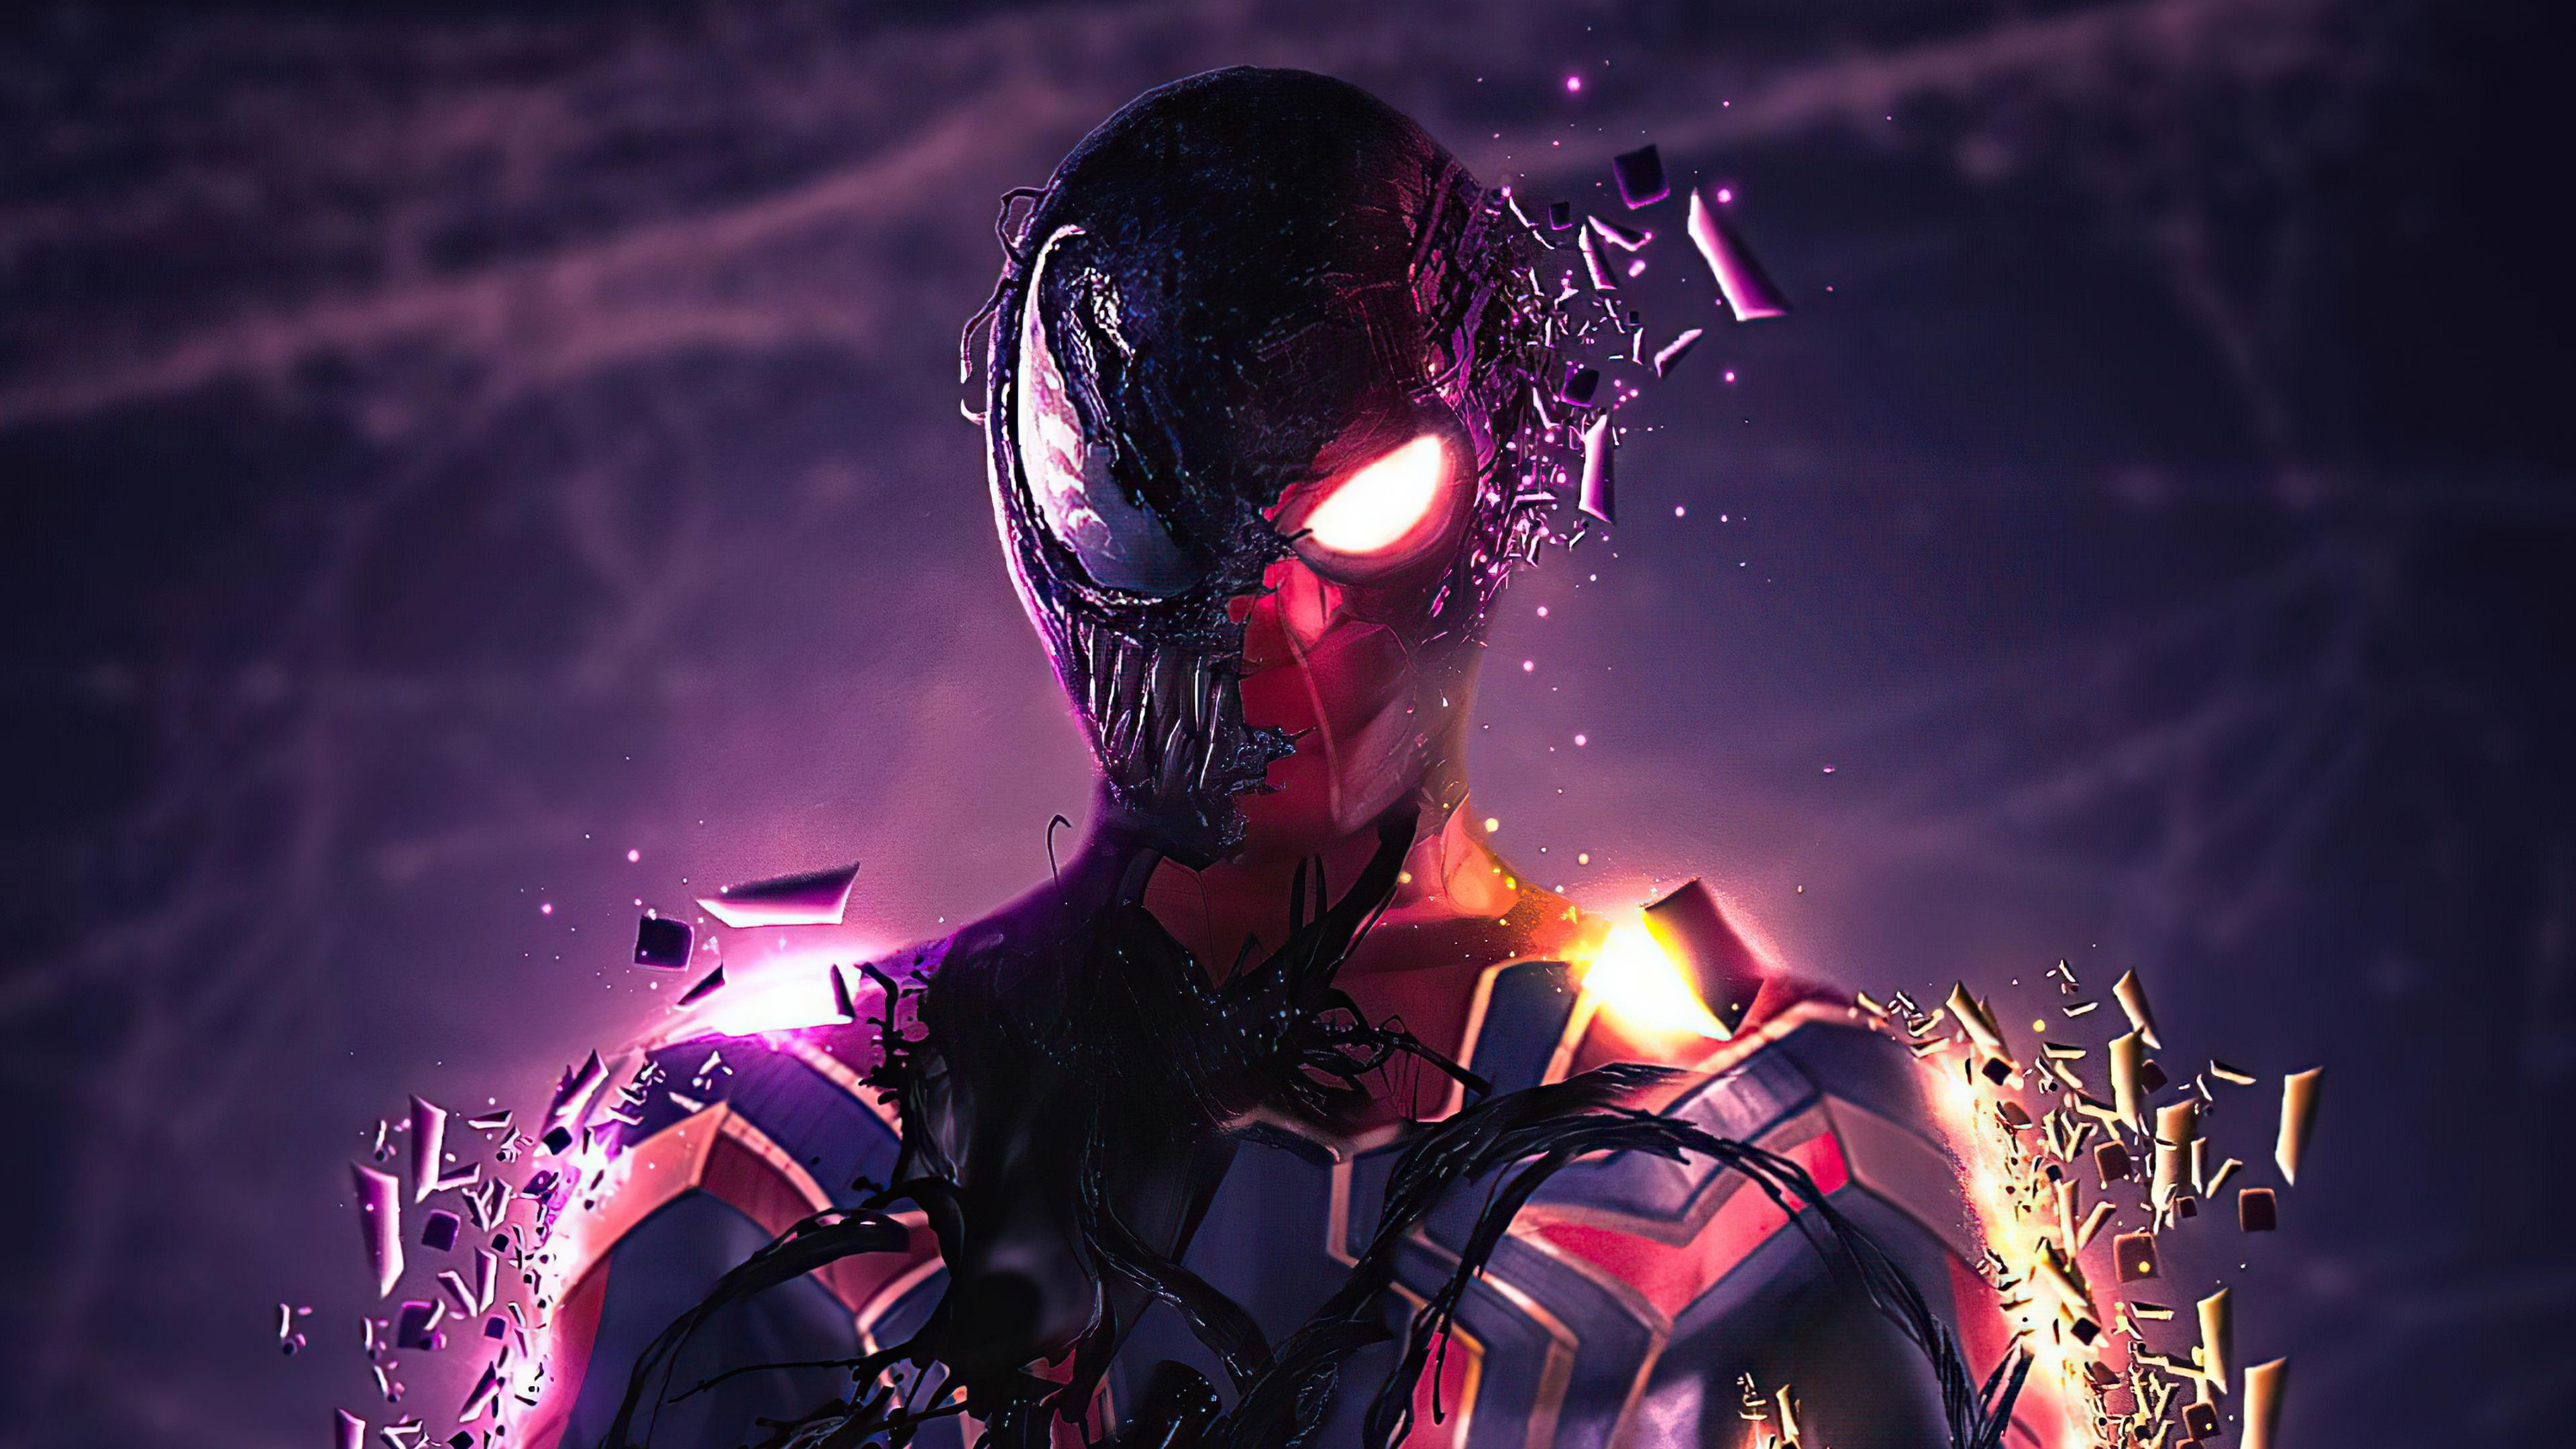 spidey venom 4k 1619216109 - Spidey Venom 4k - Spidey Venom 4k wallpapers